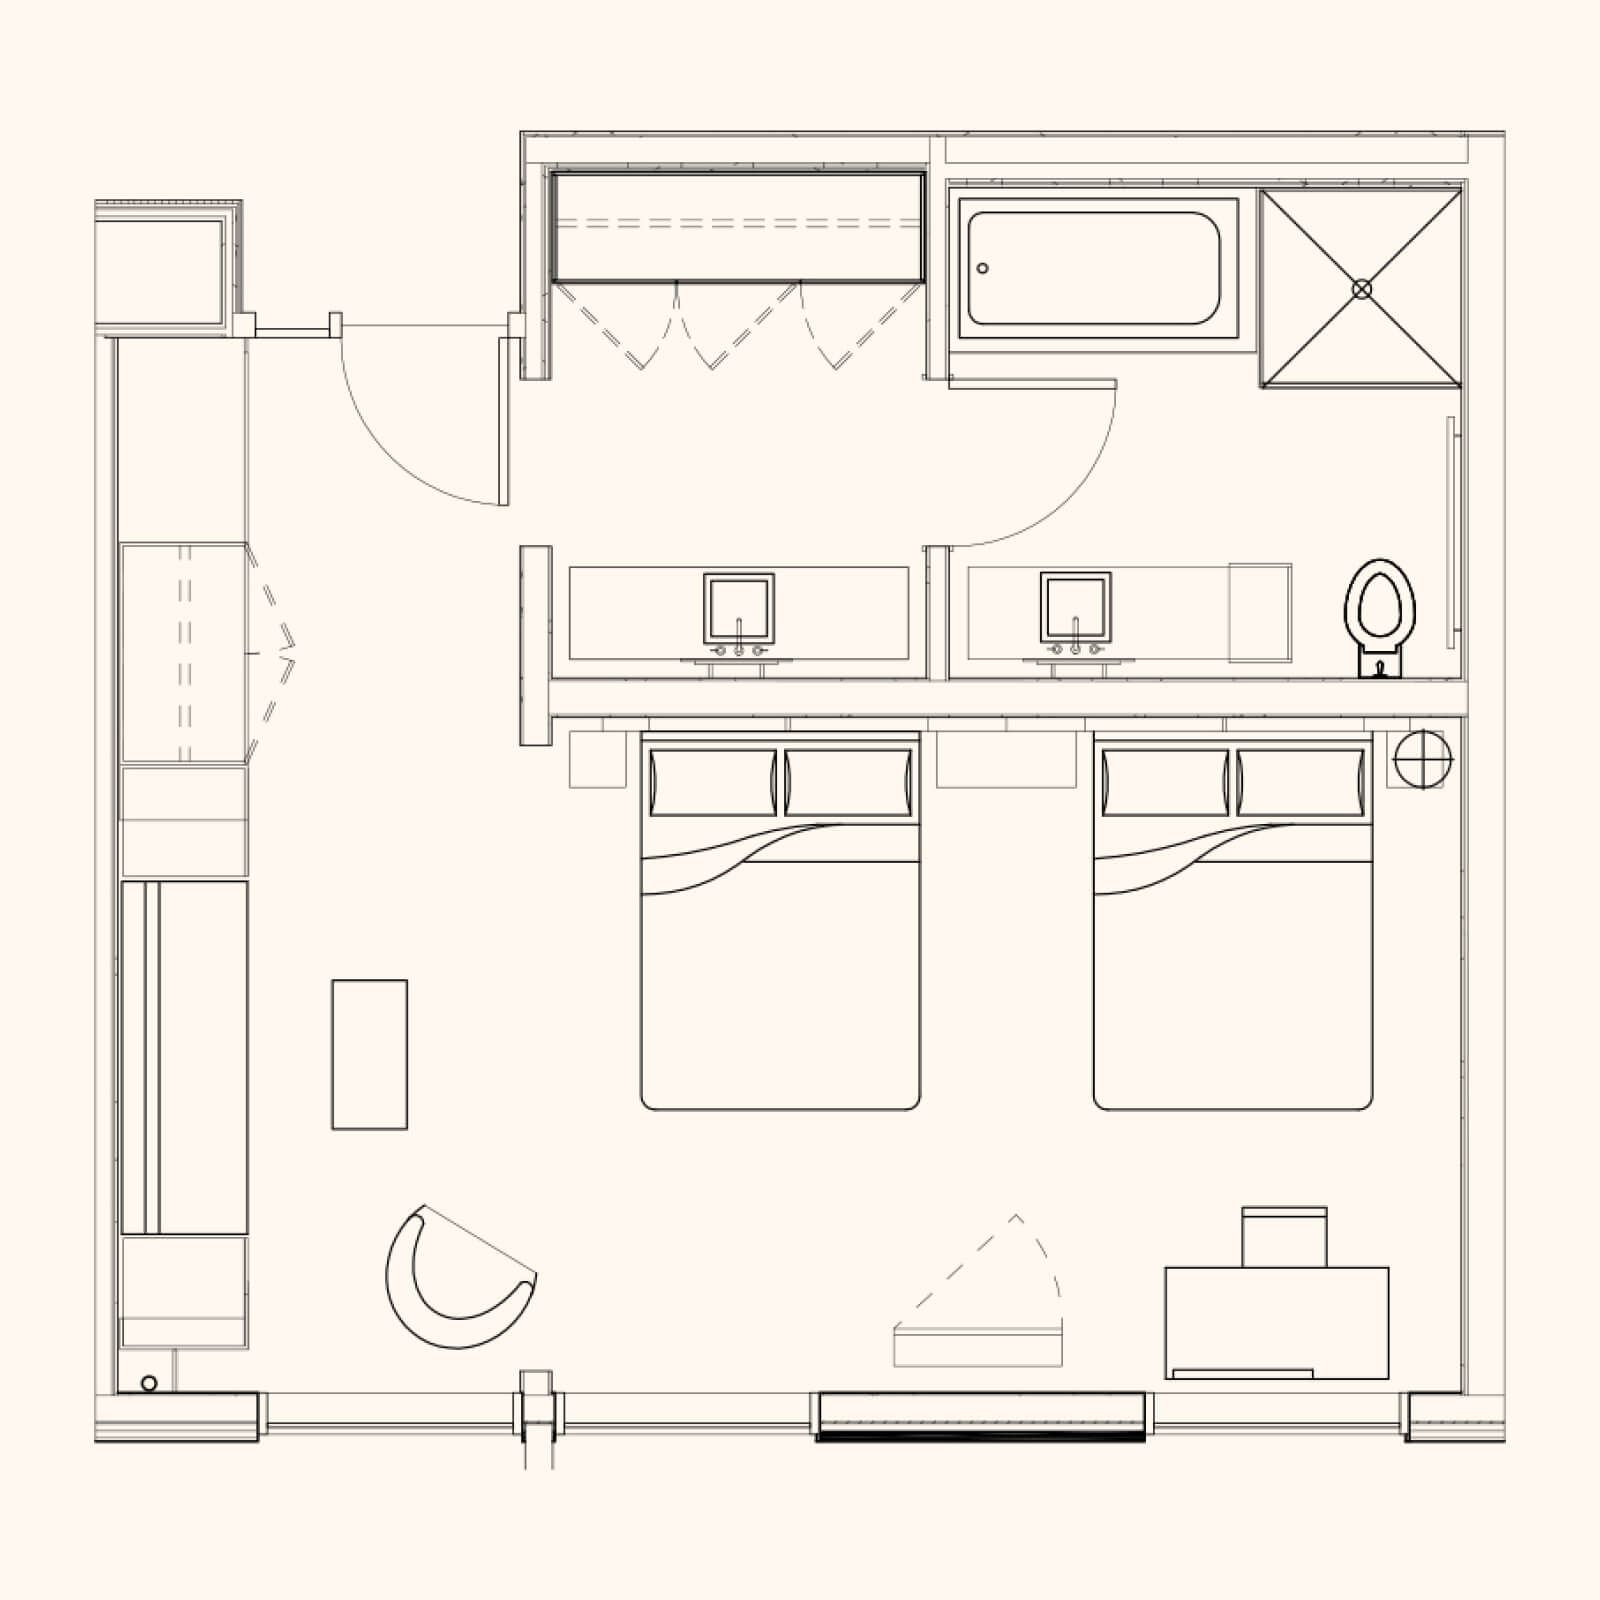 Pin By Pop Tiramongkol On Space Planing Layout In 2020 Small Hotel Room Hotel Room Plan Small Hotel